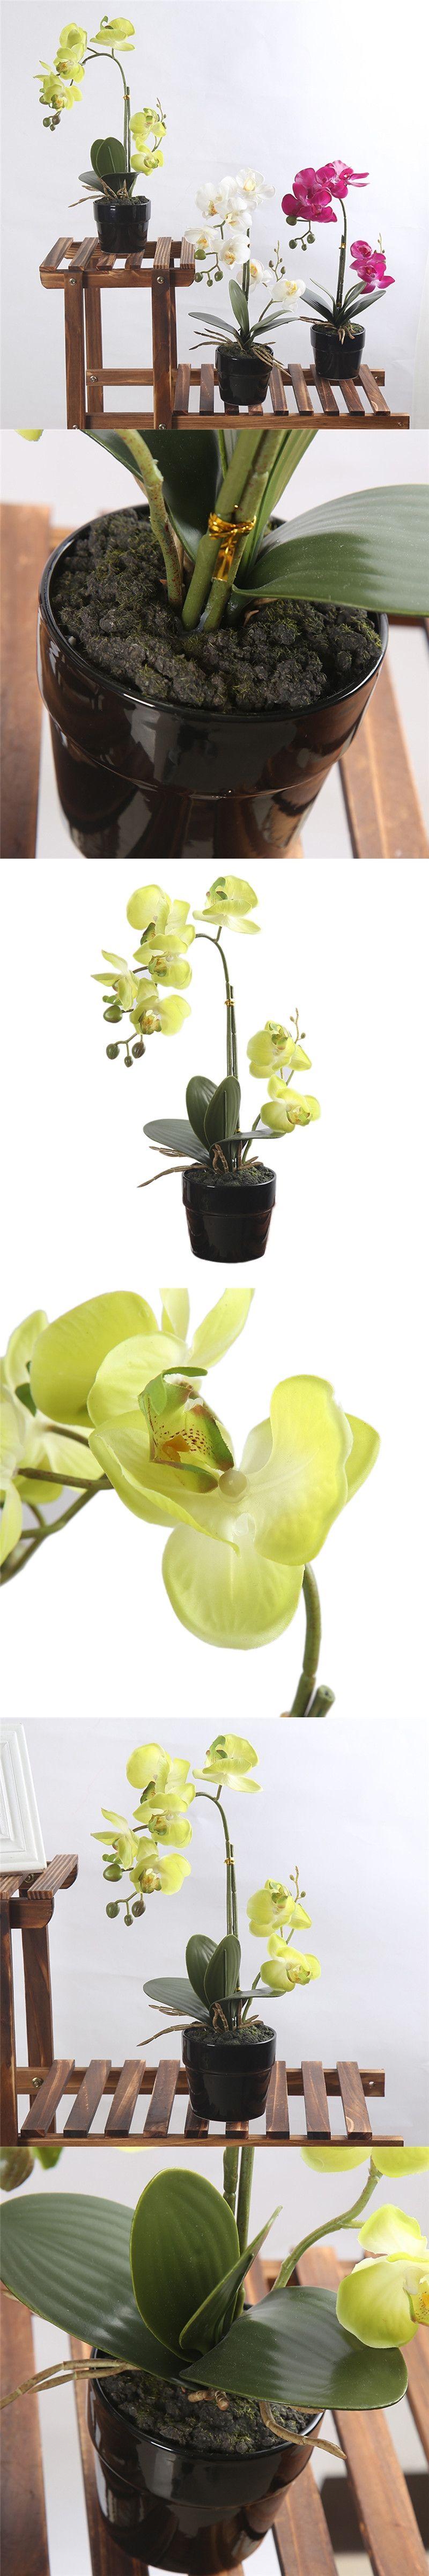 Wedding decorations home  Artificial Bonsai Decoration Simulation Phalaenopsis for Home